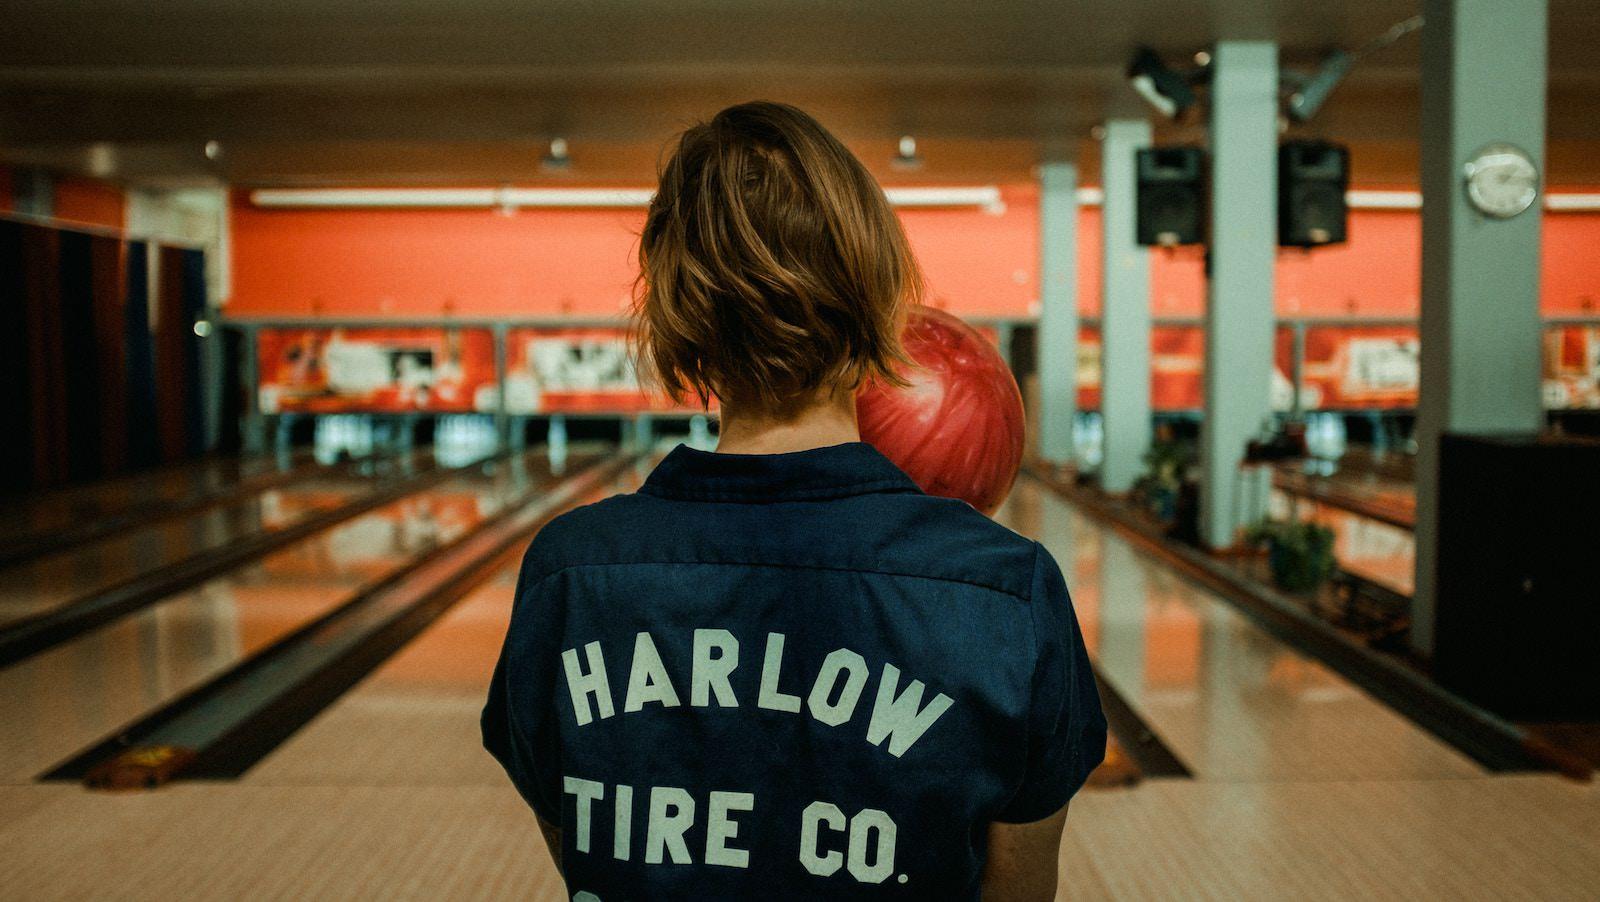 Kalle stillersson 614050 unsplash bowling